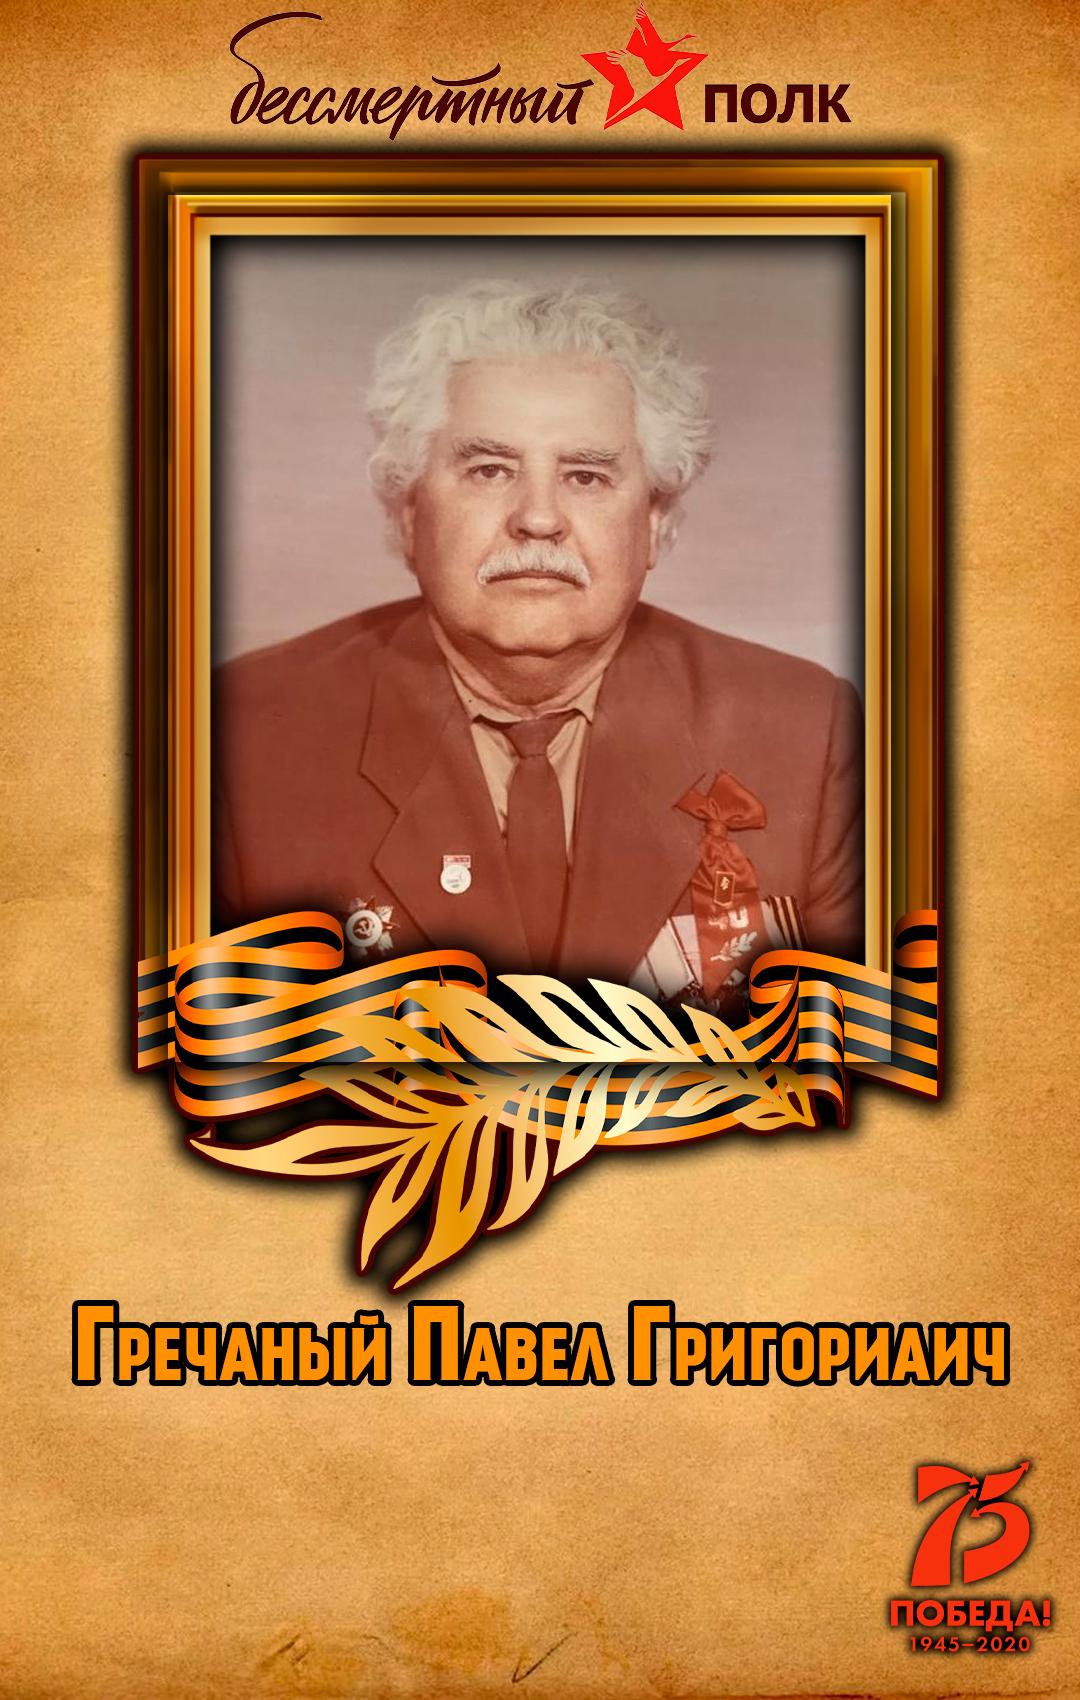 Гречаный-Павел-Григориаич